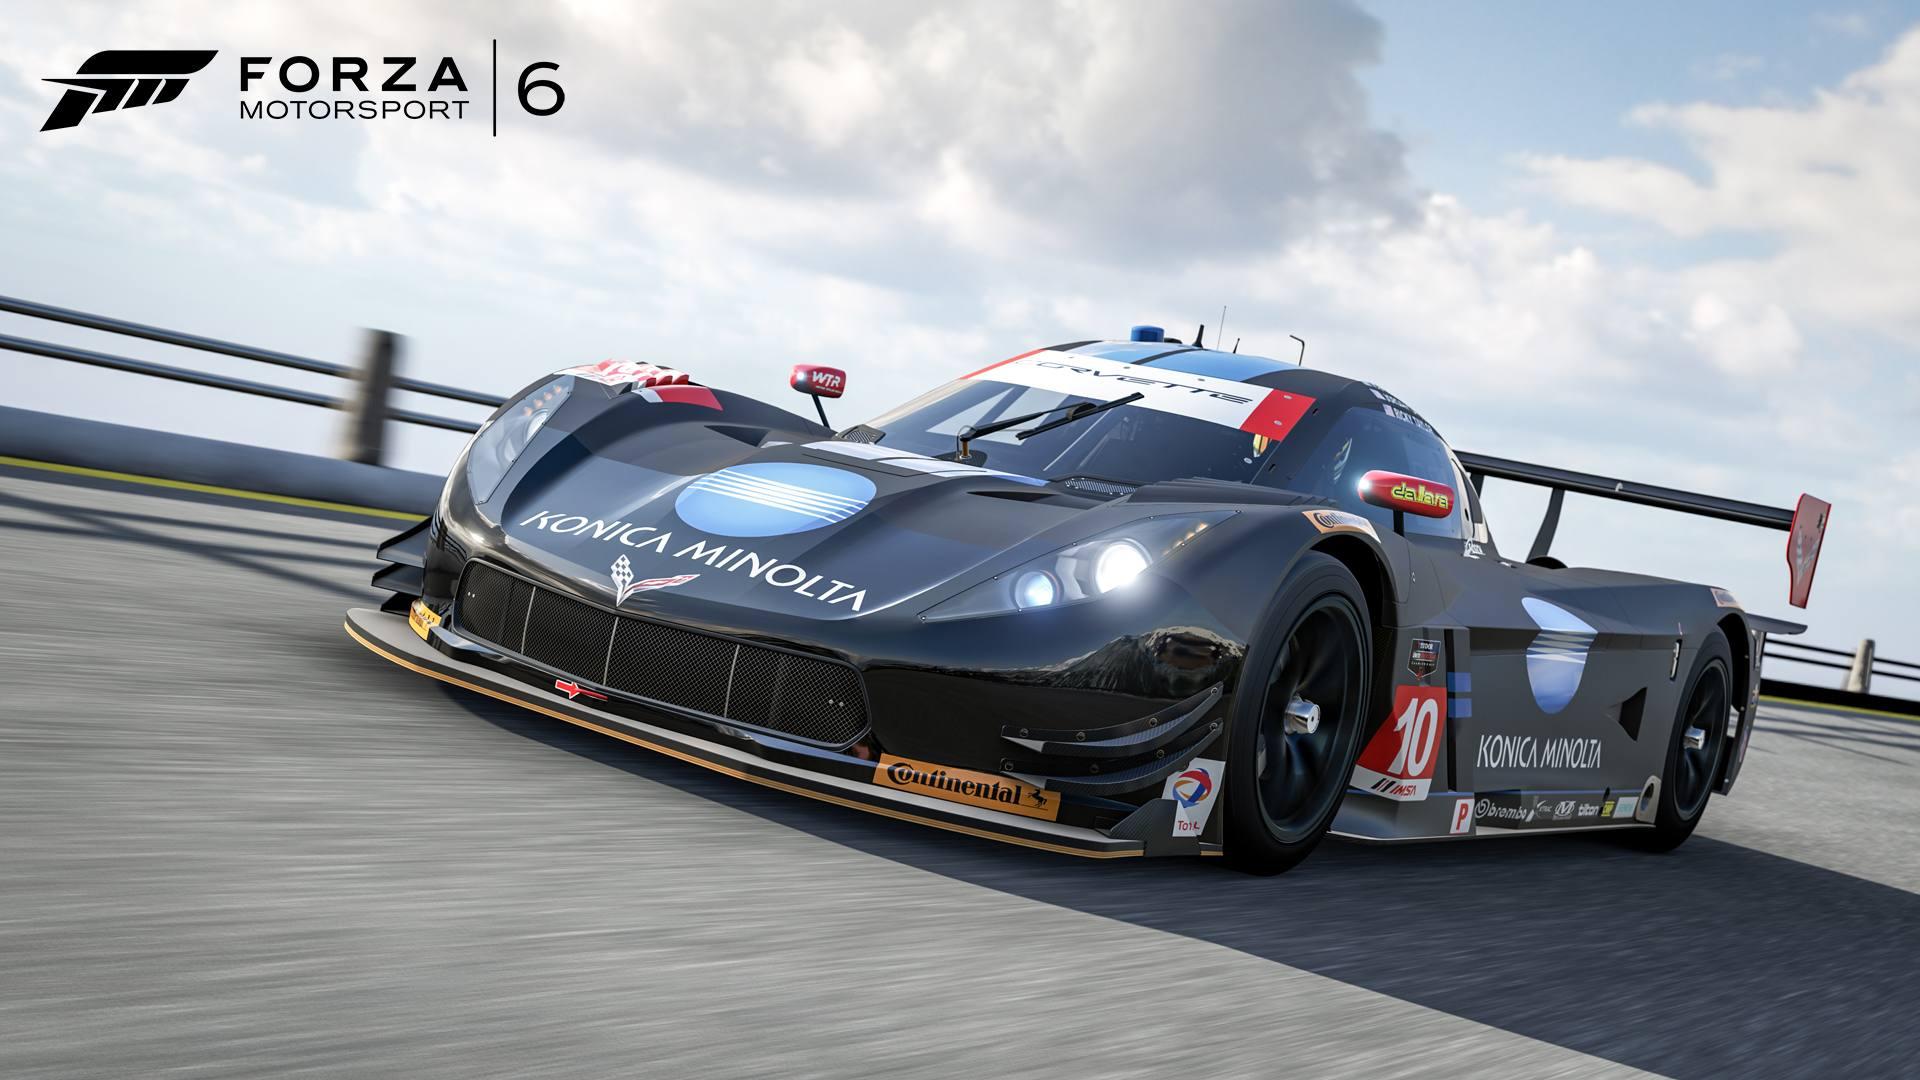 Forza Motorsport 6 14-03-16 2015 Chevrolet #10 Wayne Taylor Racing Corvette Daytona Prototype 001